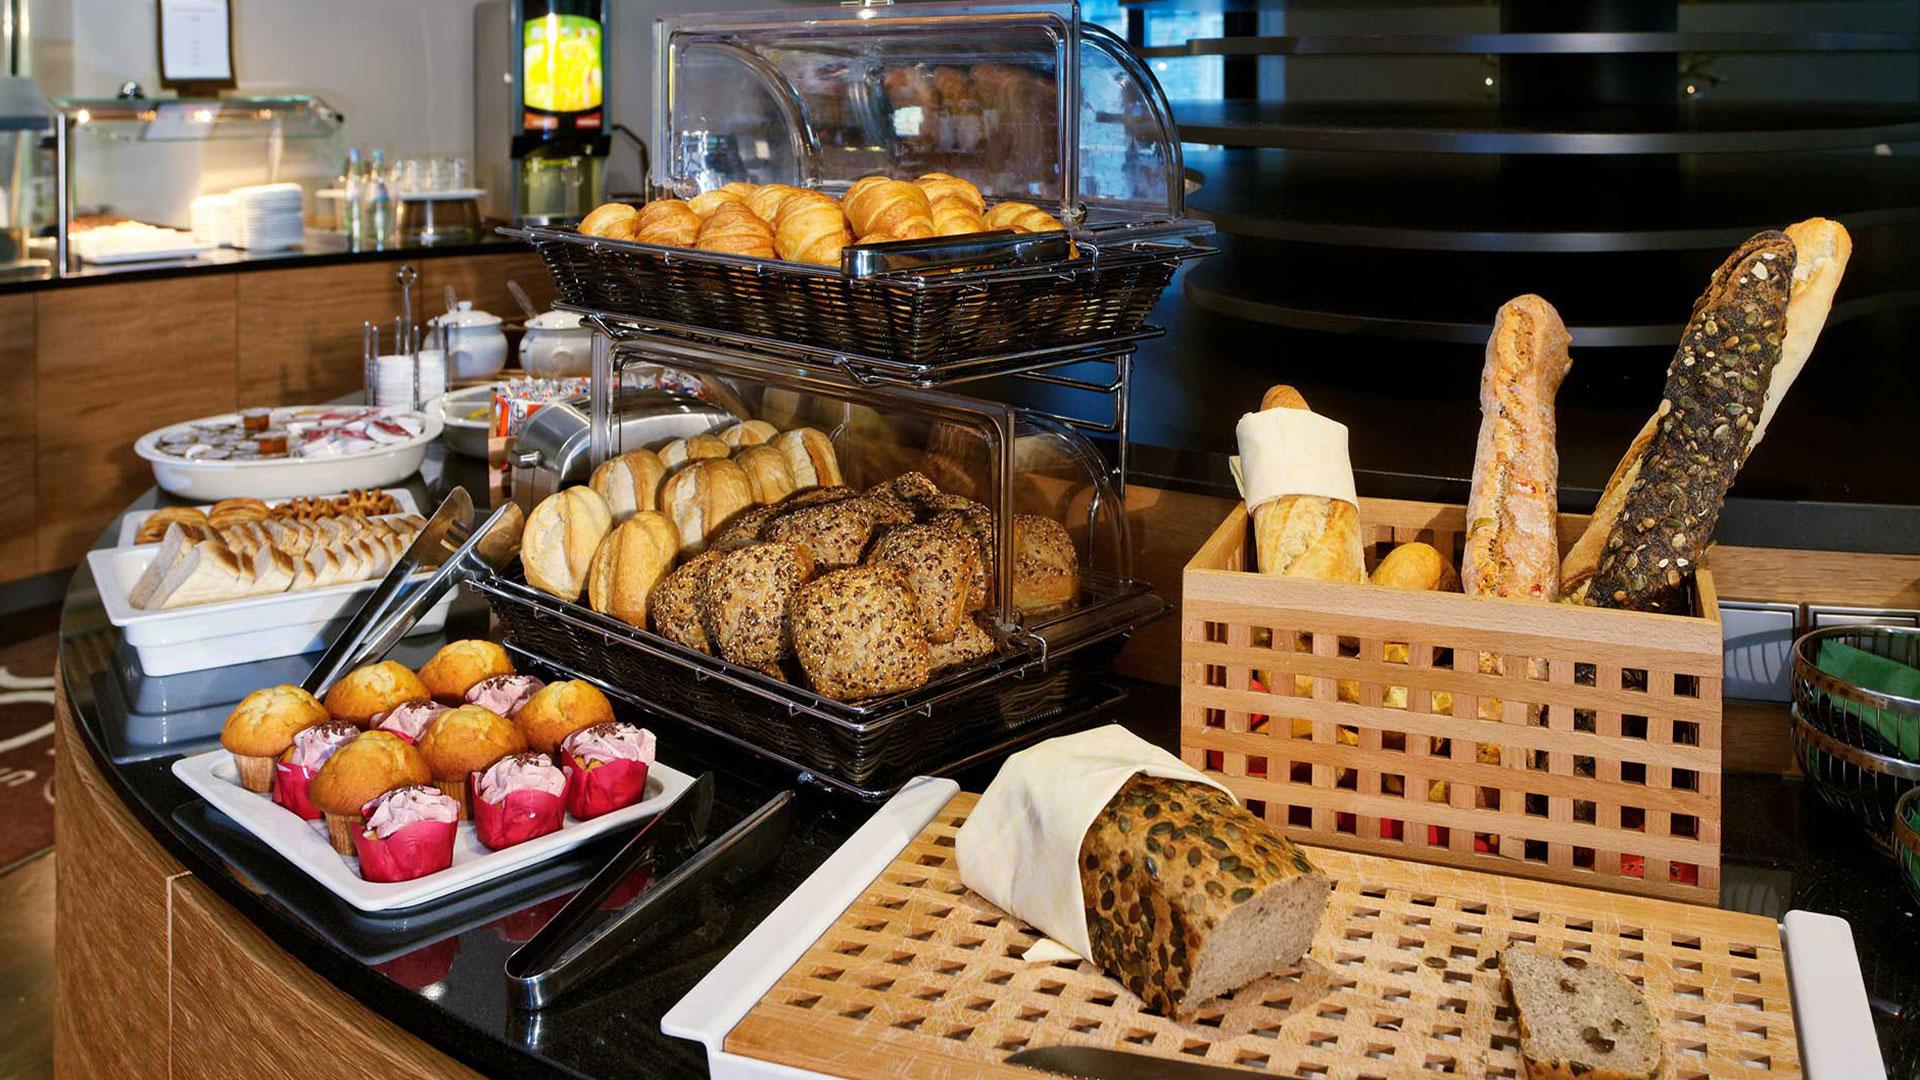 Photo of the breakfast area - 02 - Hanse Hotel Attendorn